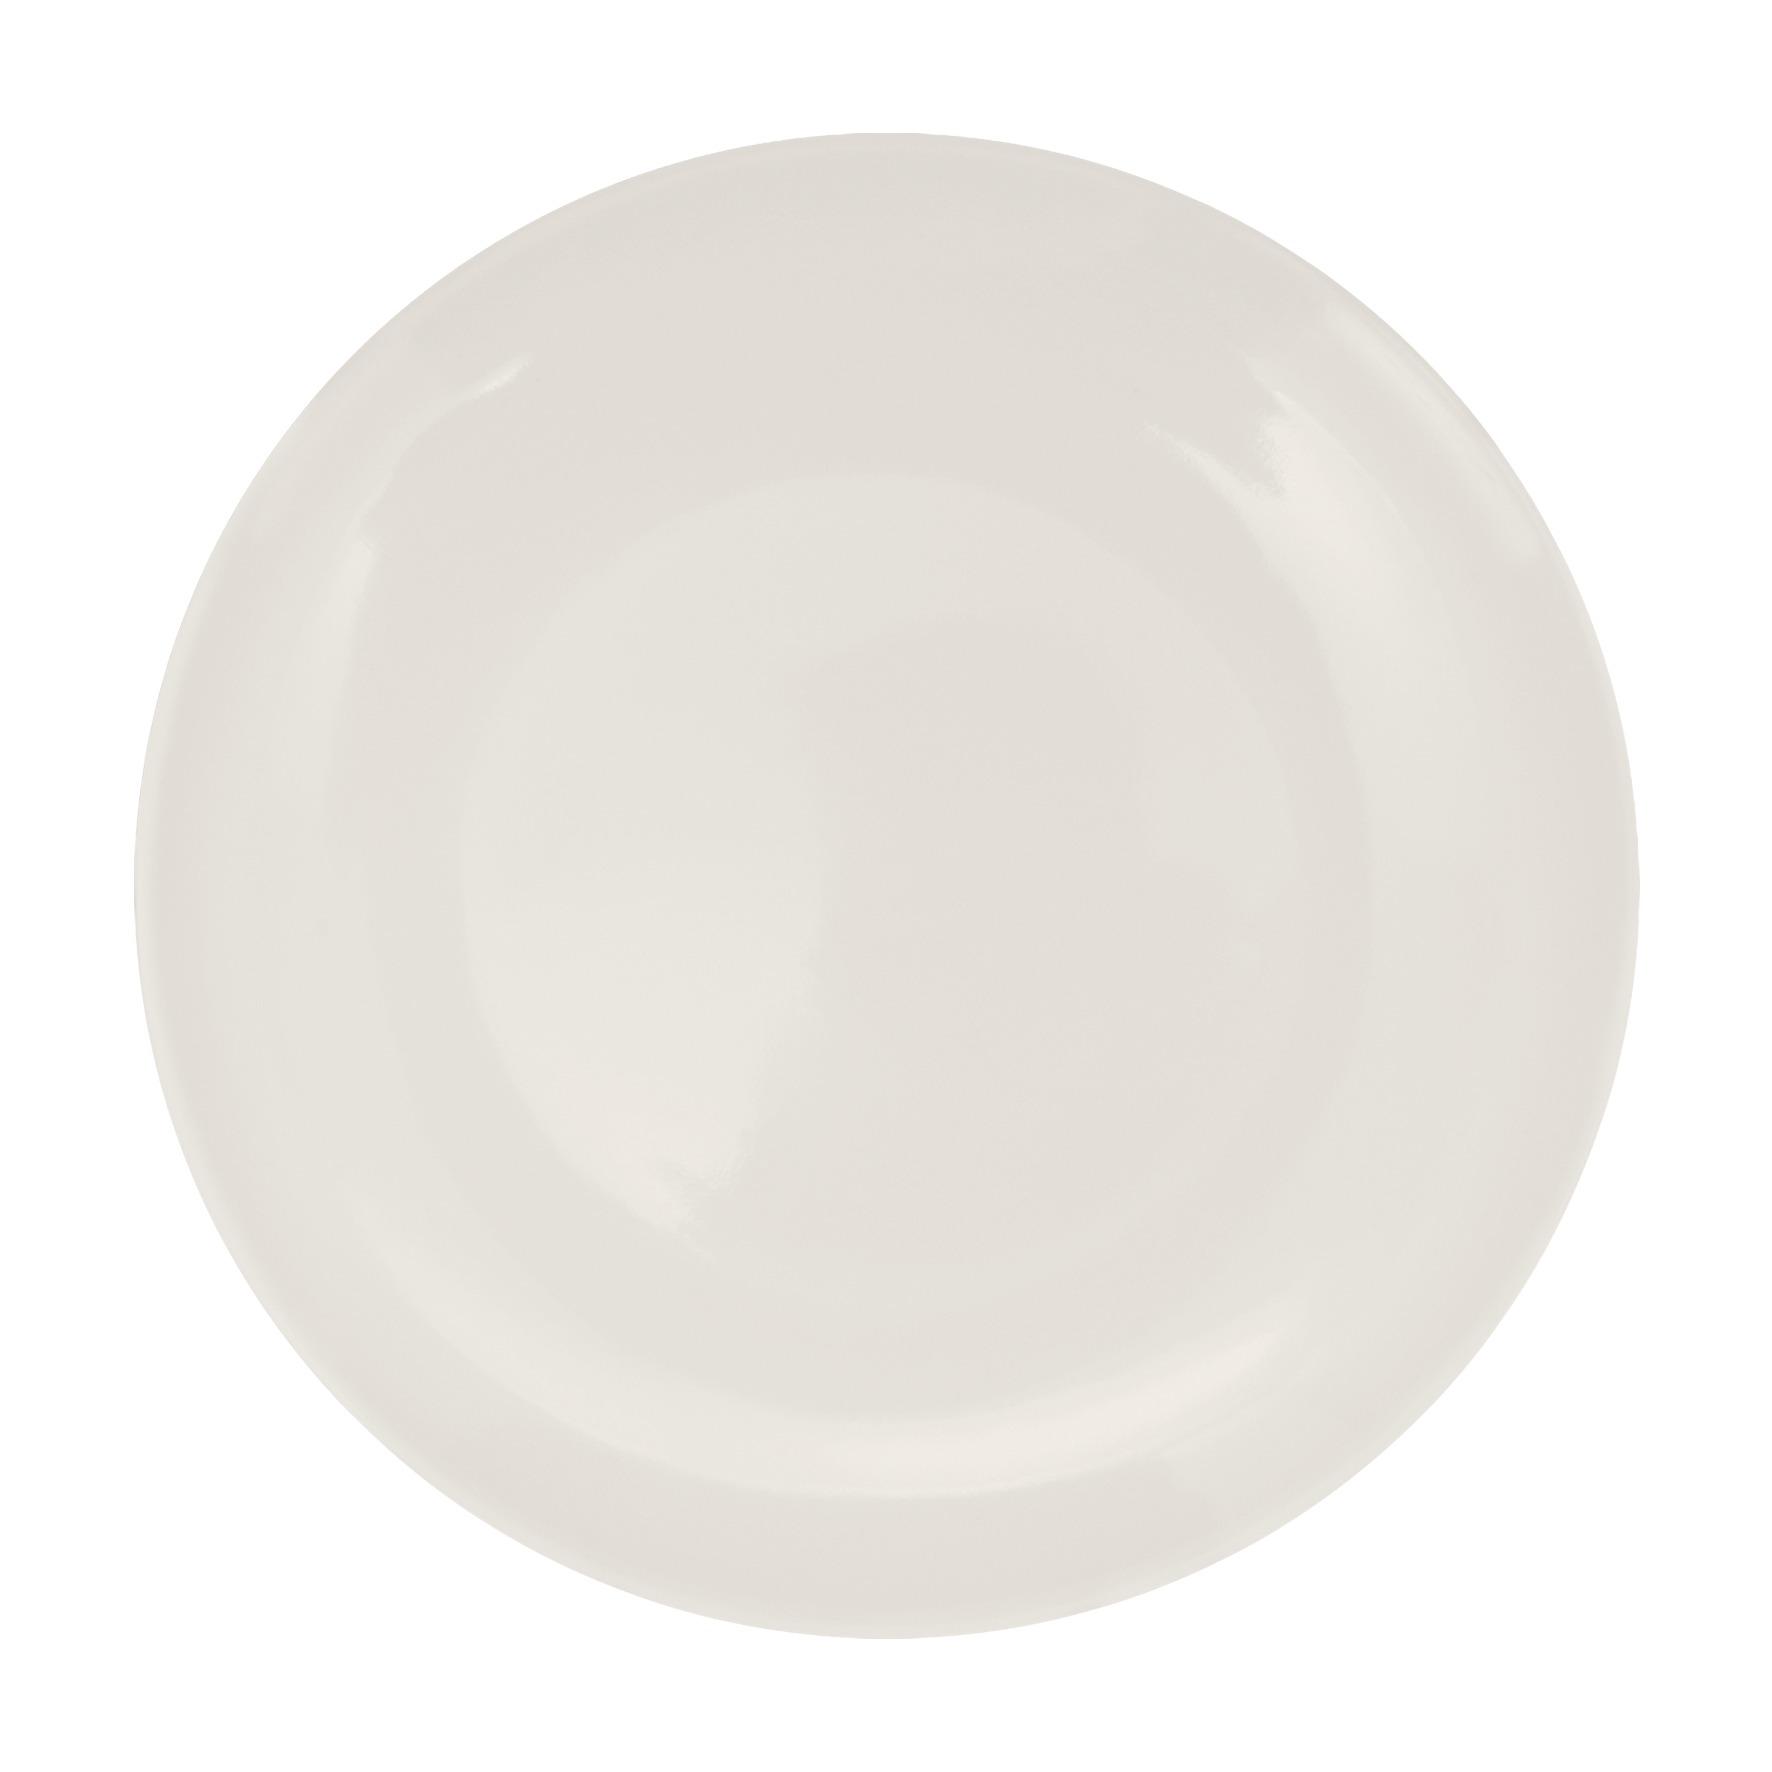 Prato Raso 25cm de Melamina Branco - Yangzi